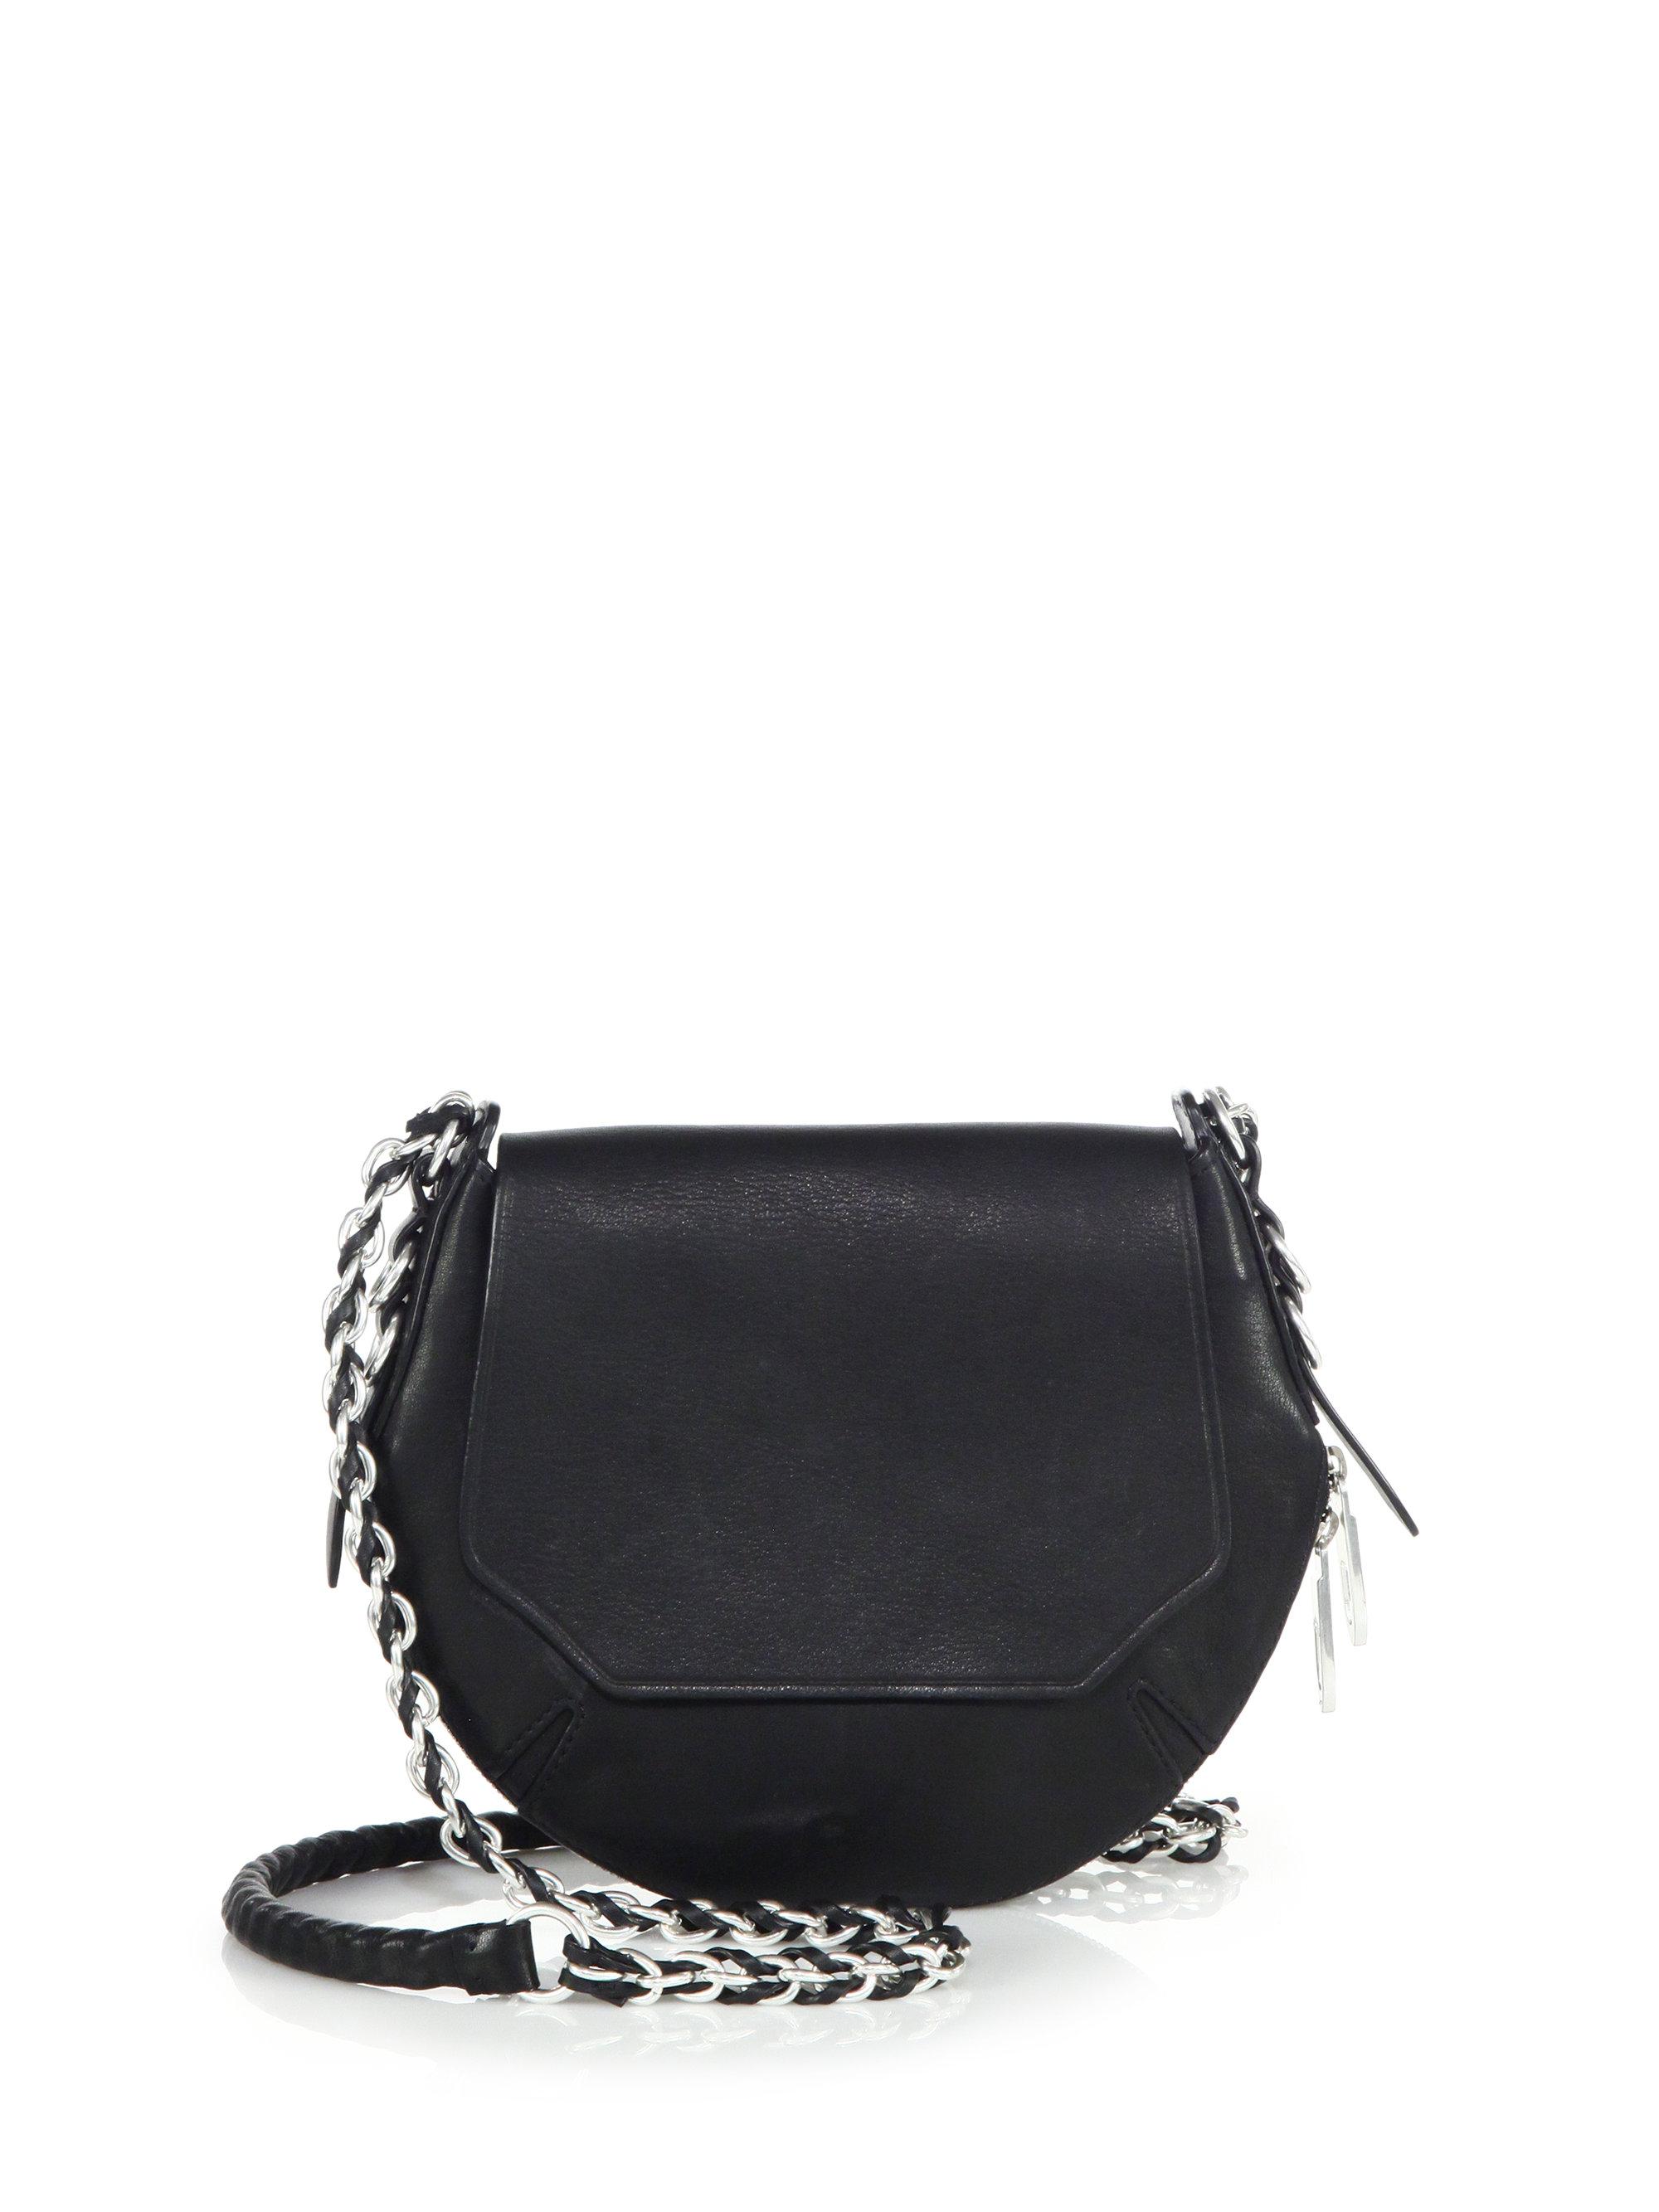 rag bone bradbury mini flap crossbody bag in black lyst